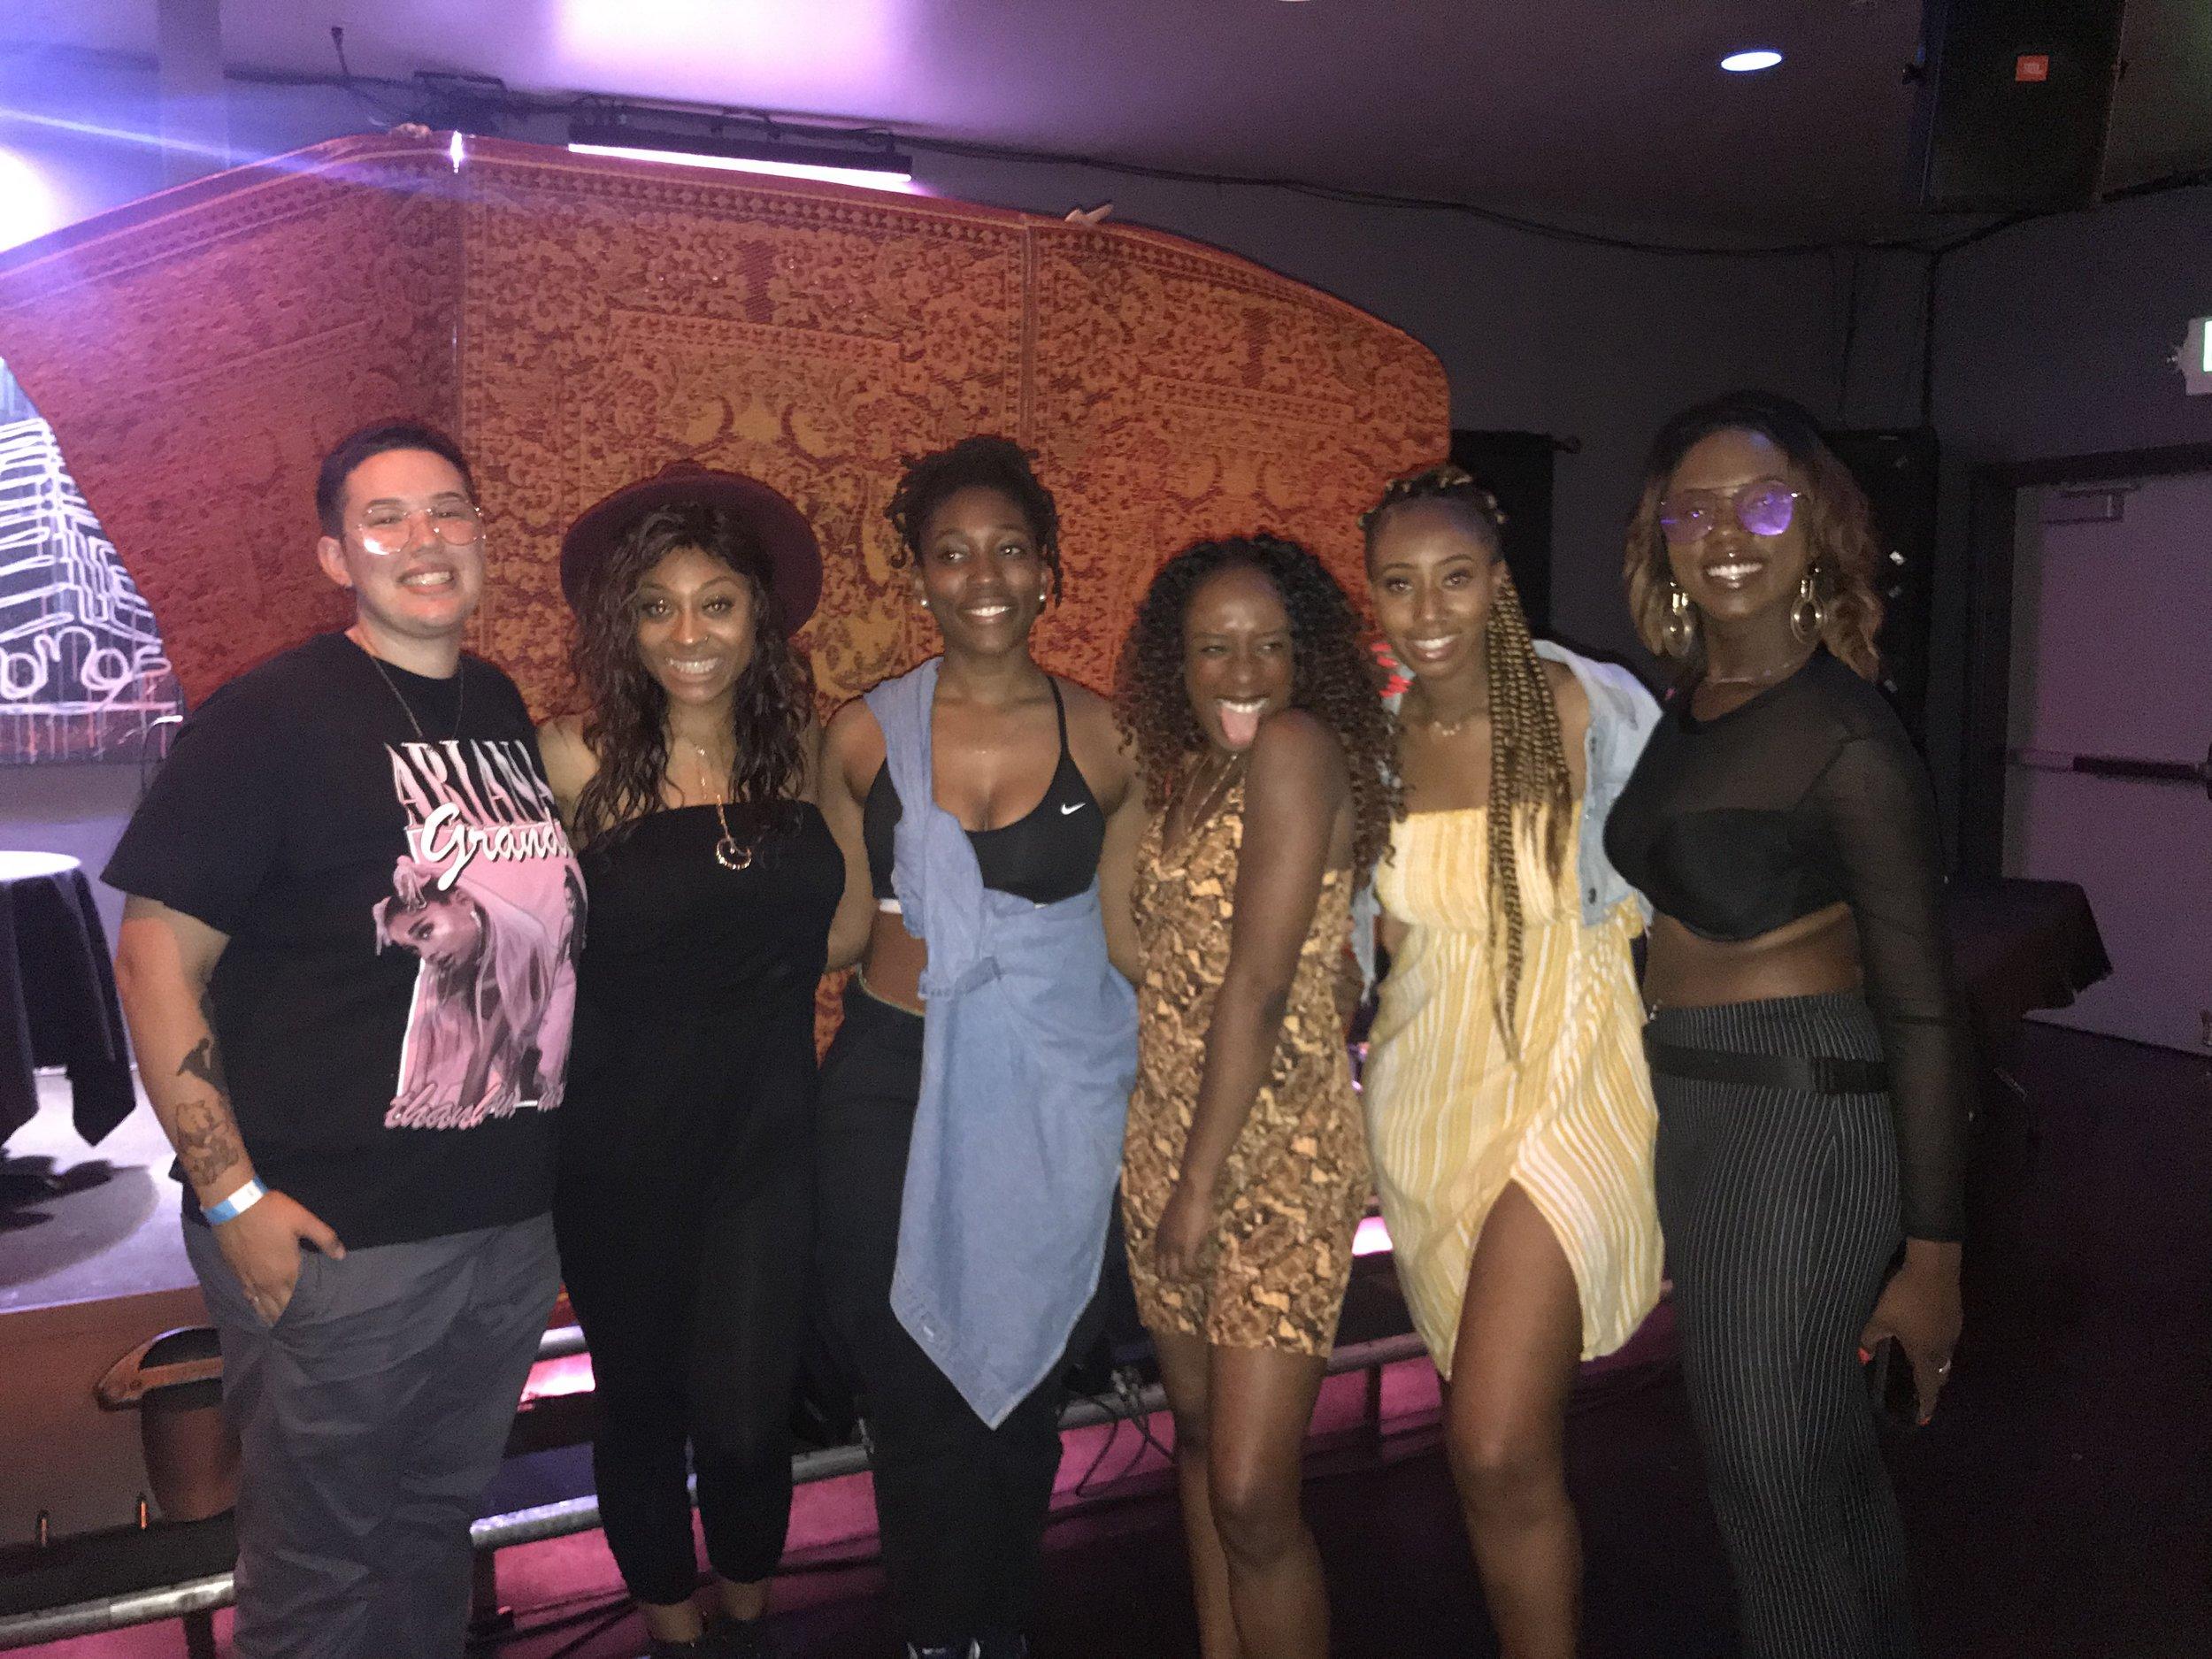 from l to r: DJ Madeinchynaa, Kendra DeAnna', Ivy Sole, Blossom, PARISALEXA, Phat Joe